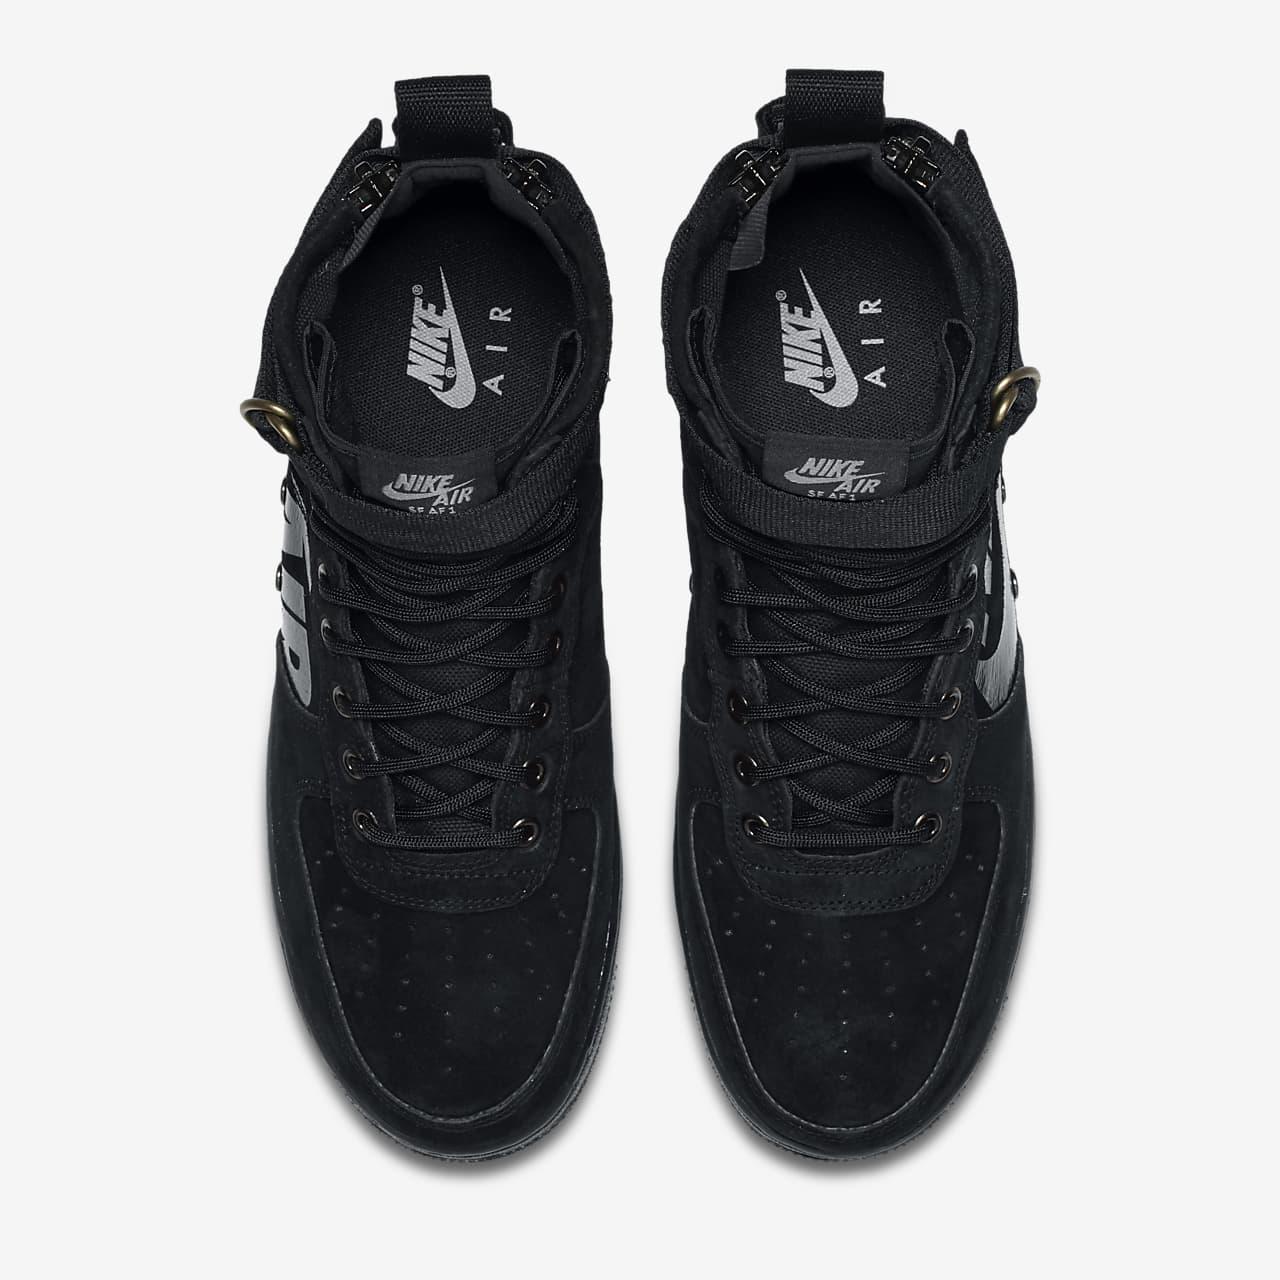 Nike sportswear Sf air force 1 mid Taglie: 917753 008